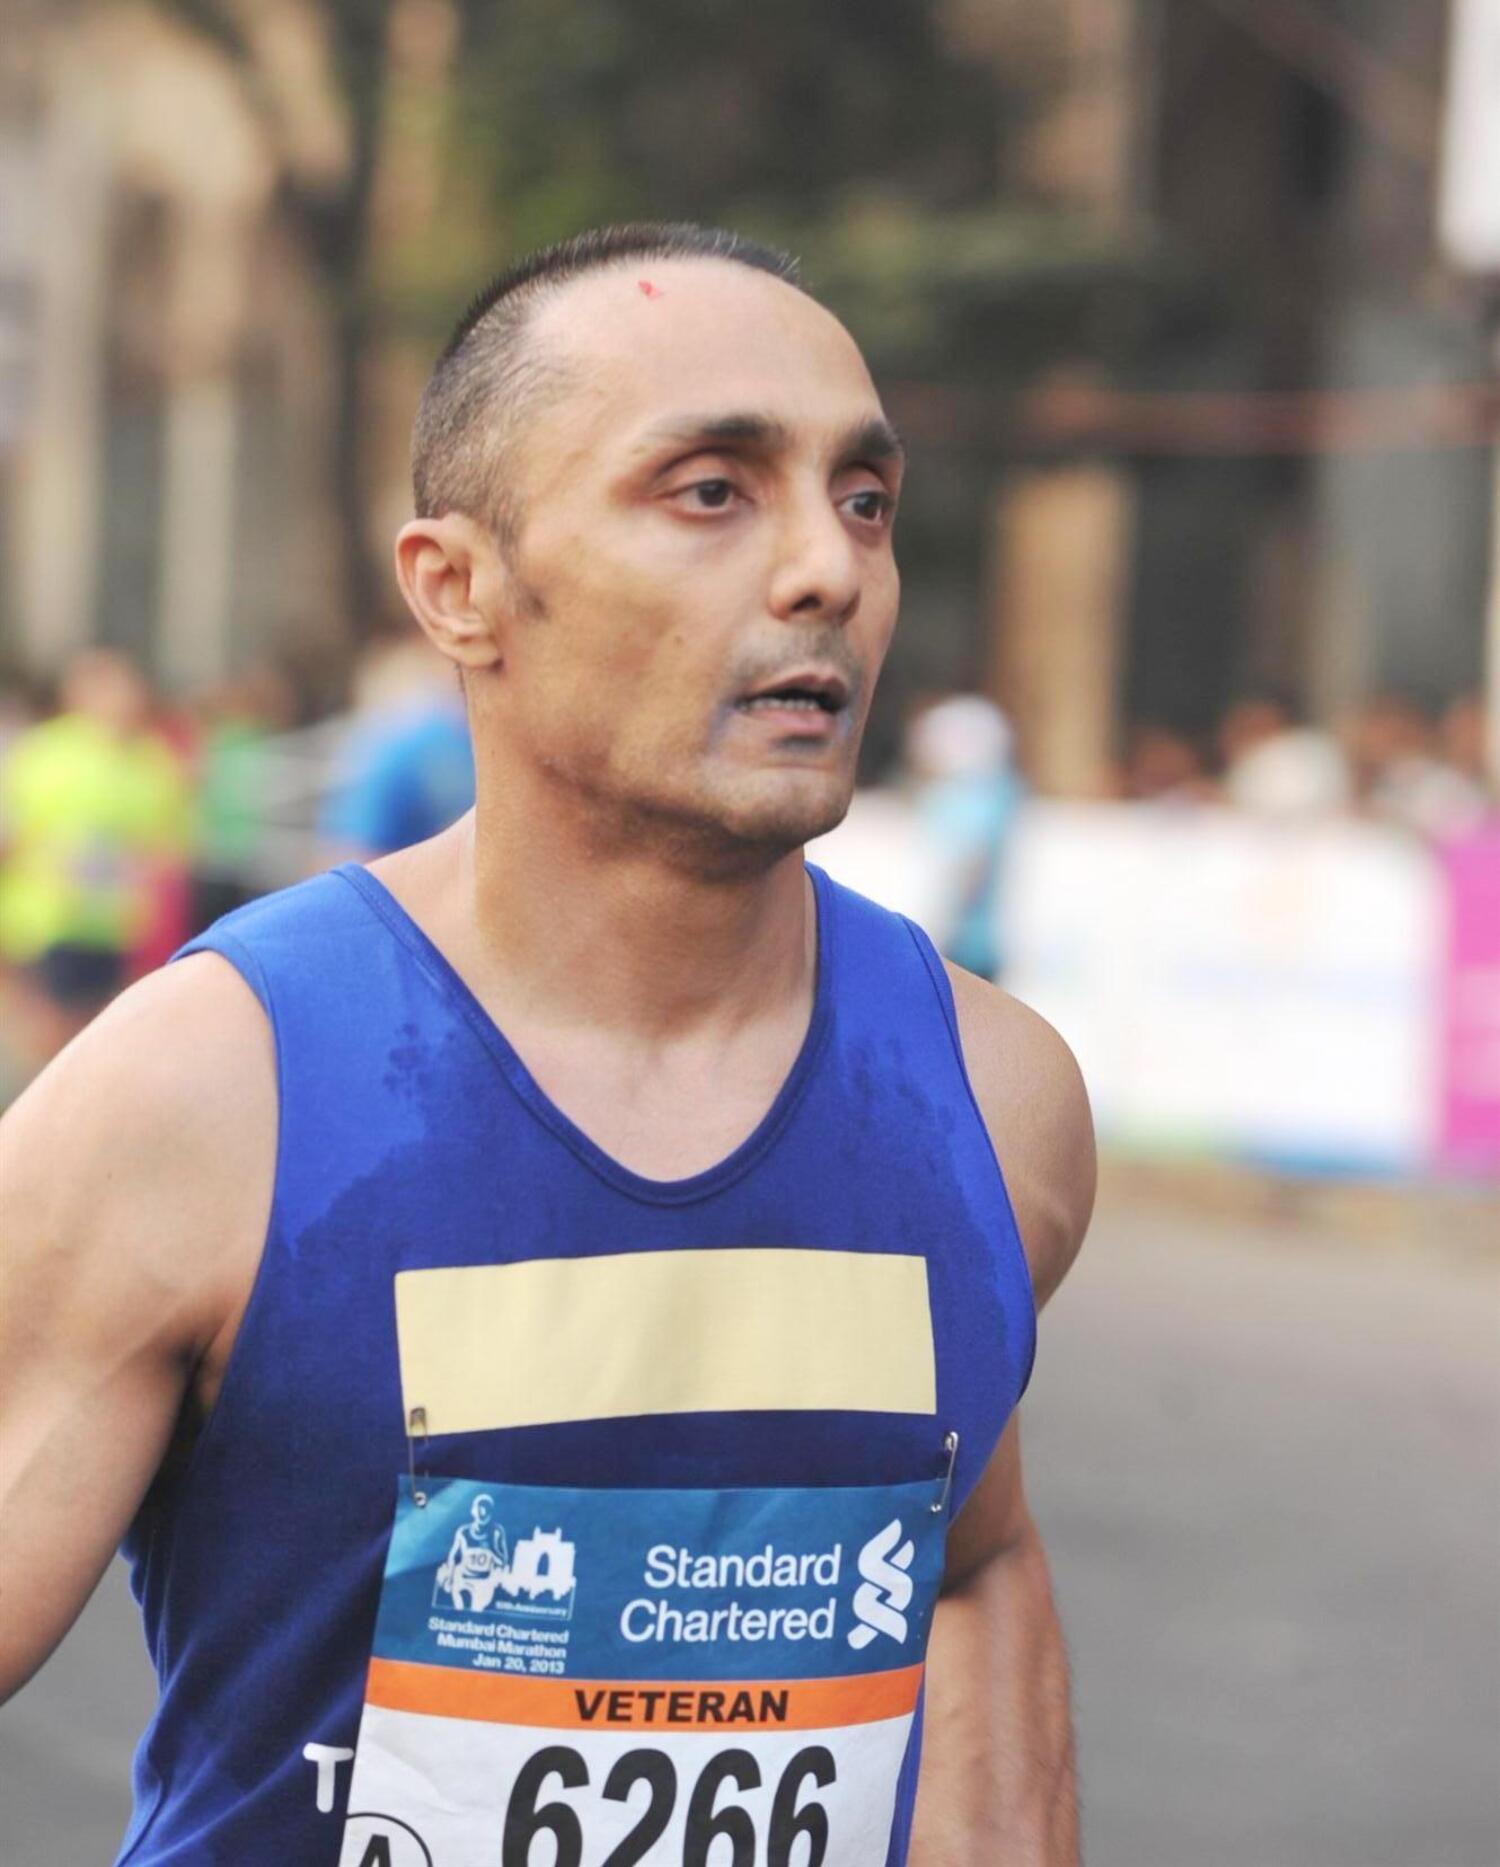 Rahul Bose At The 10th Standard Chartered Mumbai Marathon